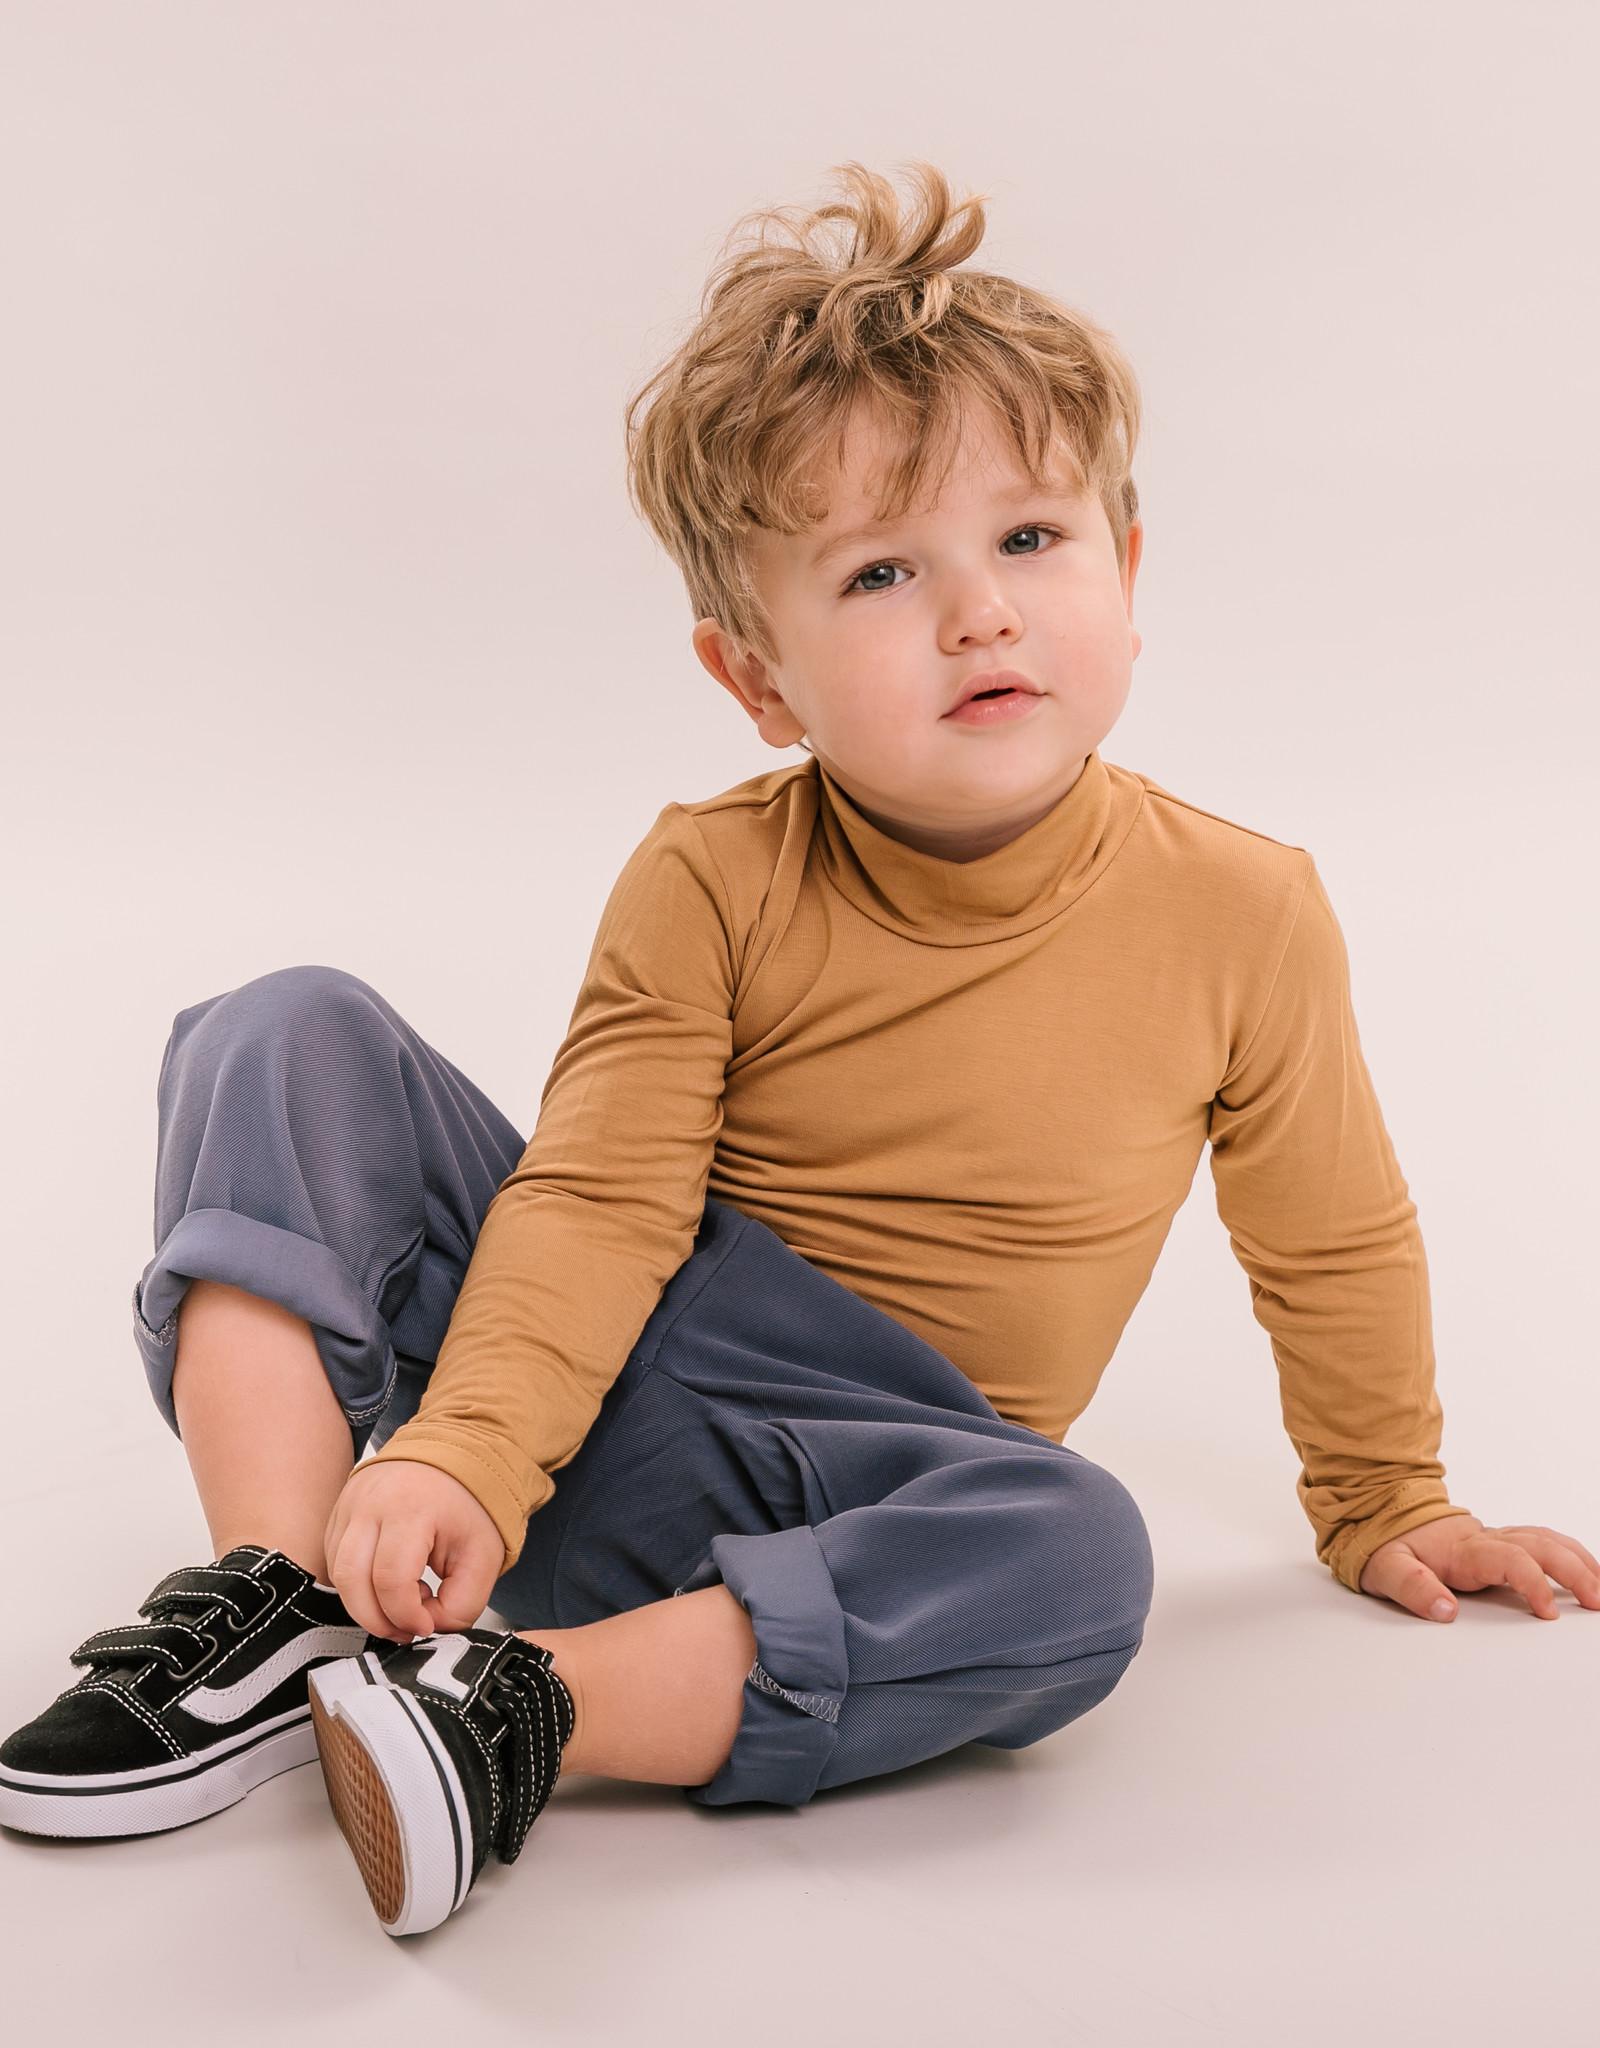 No Labels Kidswear Turtle neck top - corn